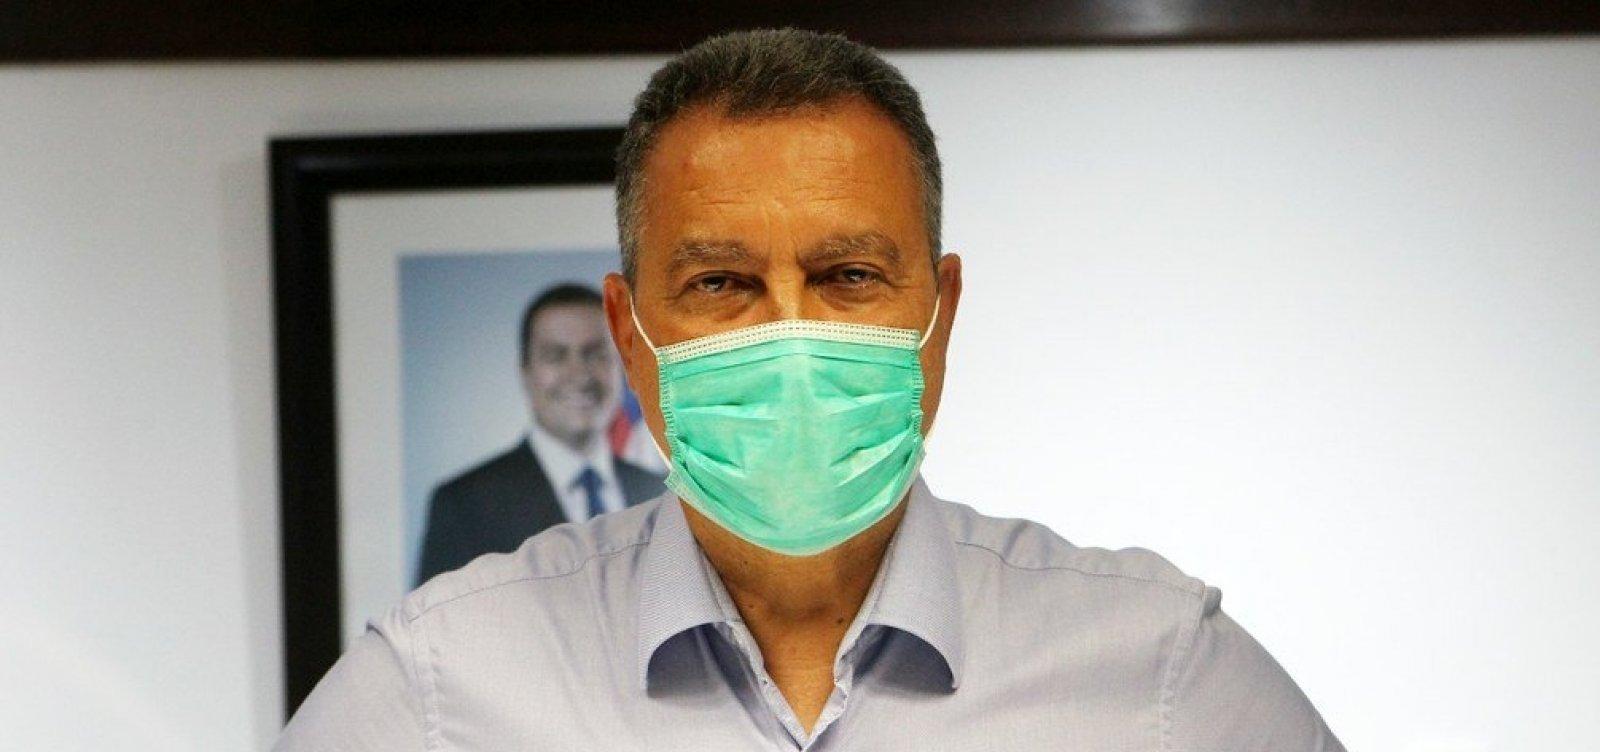 [Uso de máscara será obrigatório para todos na Bahia, anuncia Rui Costa]